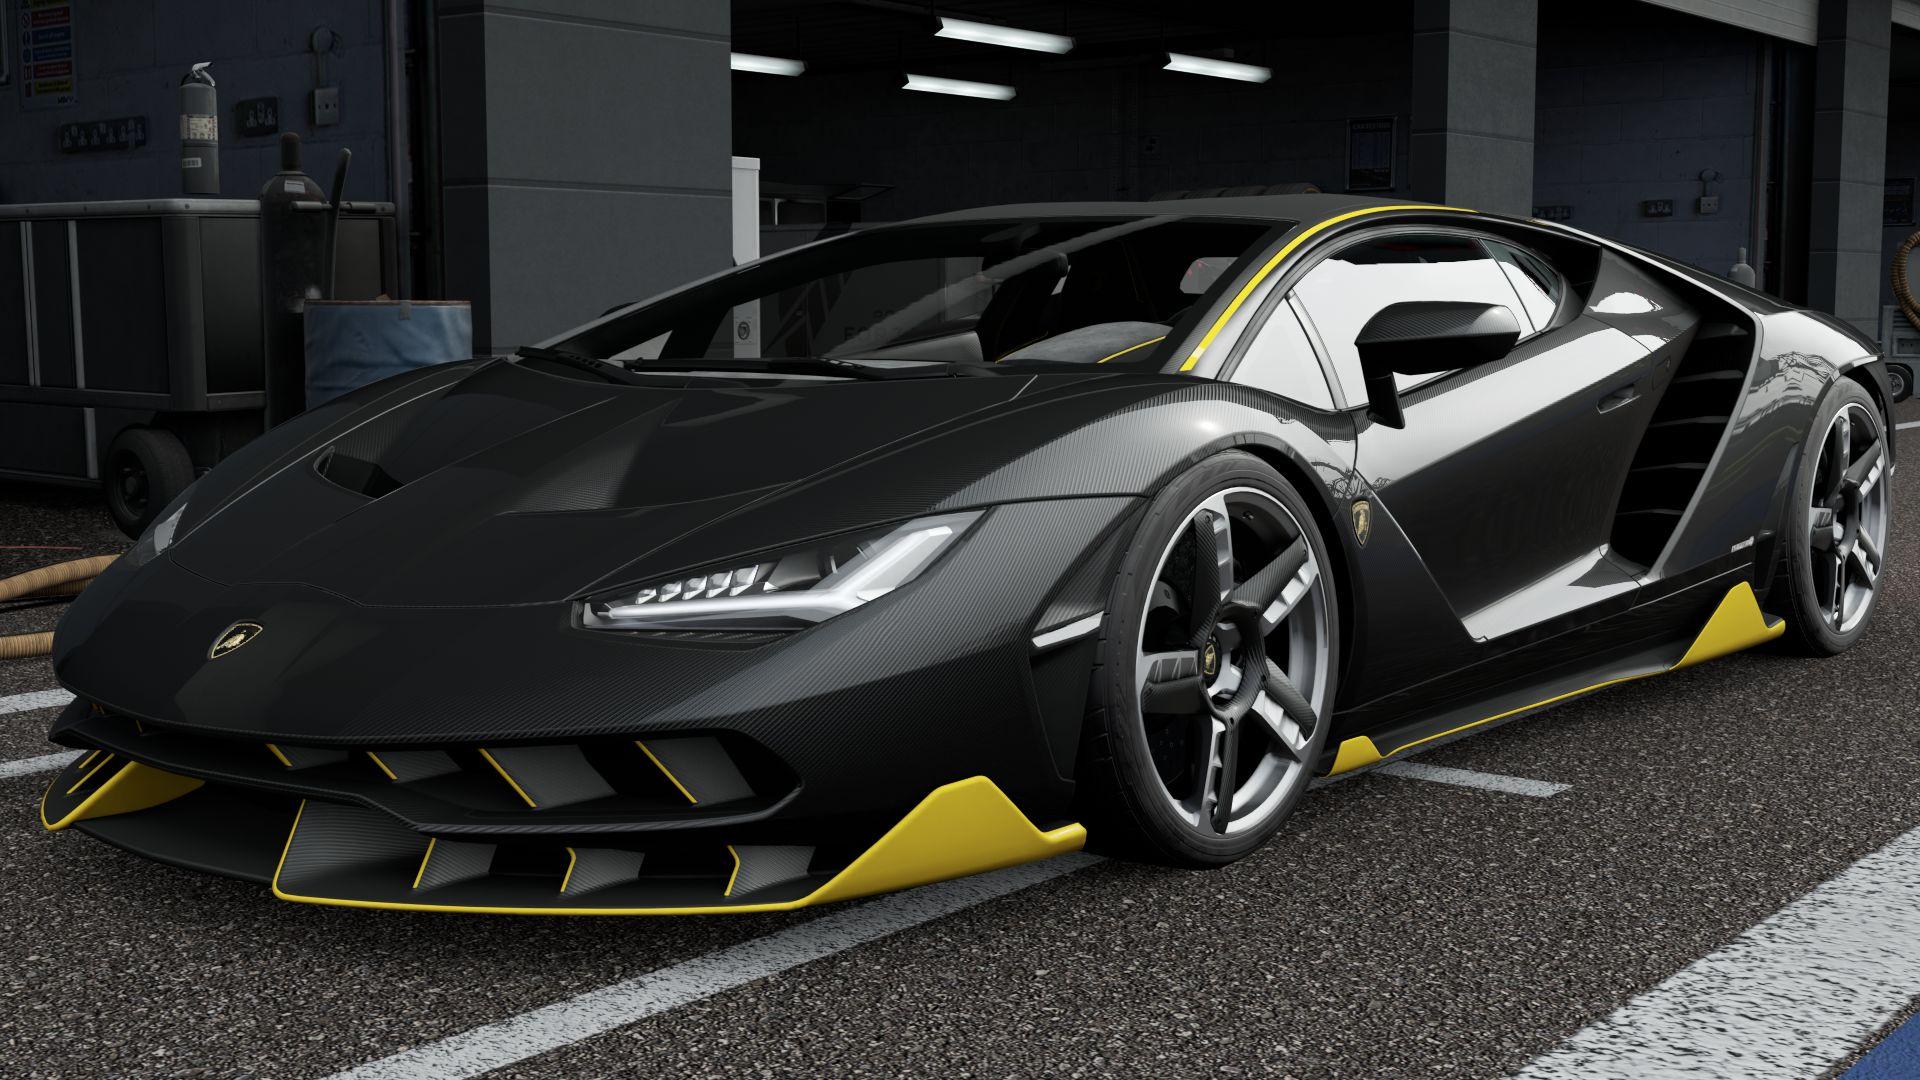 Lamborghini Centenario LP 770 4 | Forza Motorsport Wiki | FANDOM Powered By  Wikia